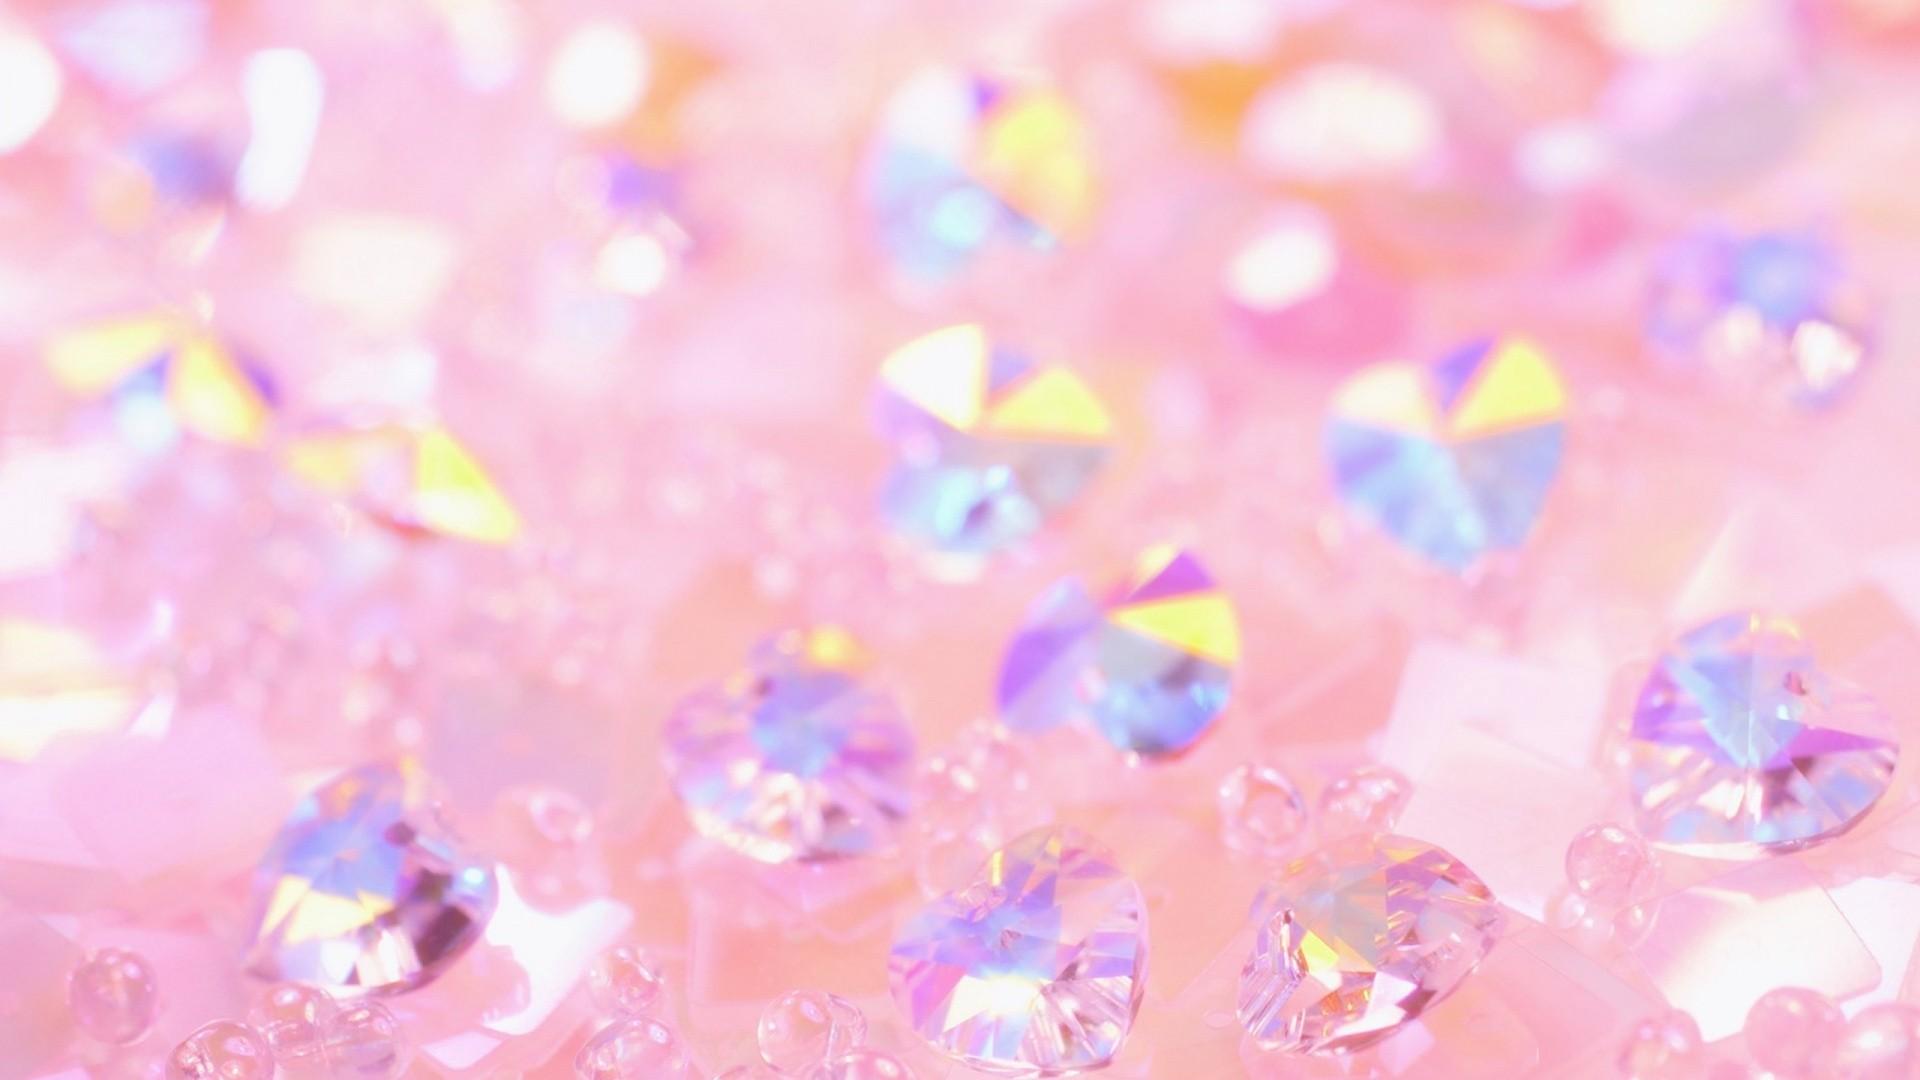 Rose Gold Cute High Quality